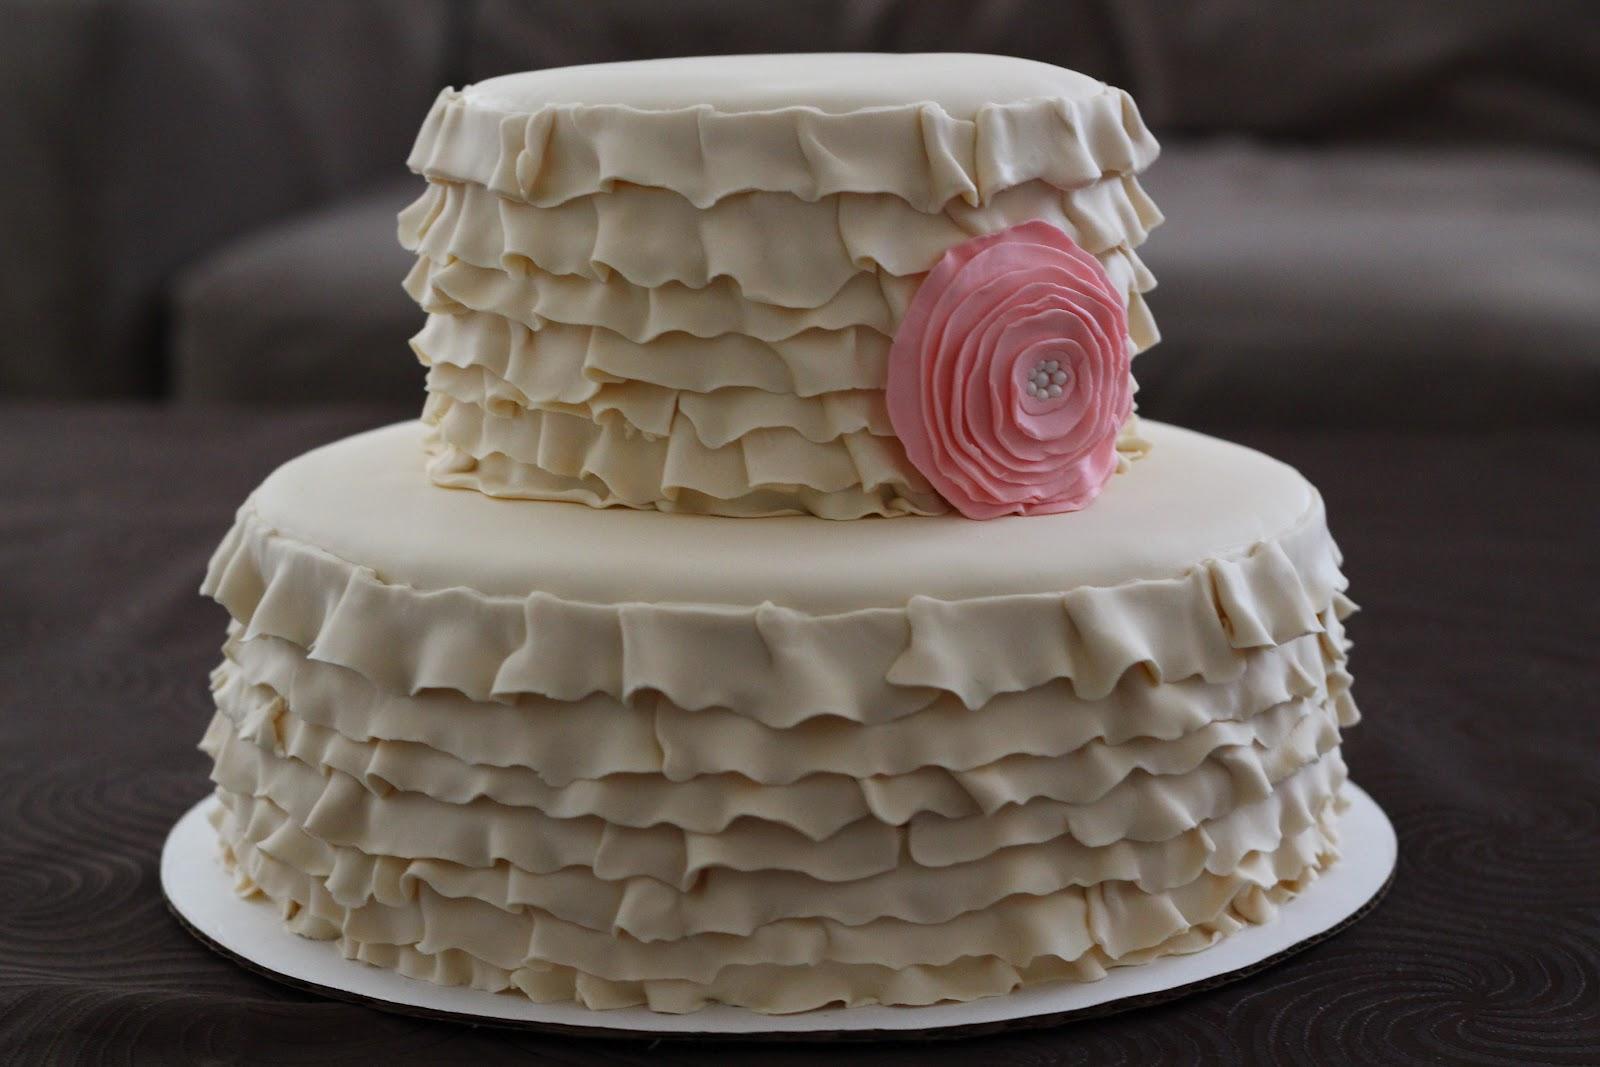 Sweet Cakes Honey Buns Ruffled Baby Shower Cake